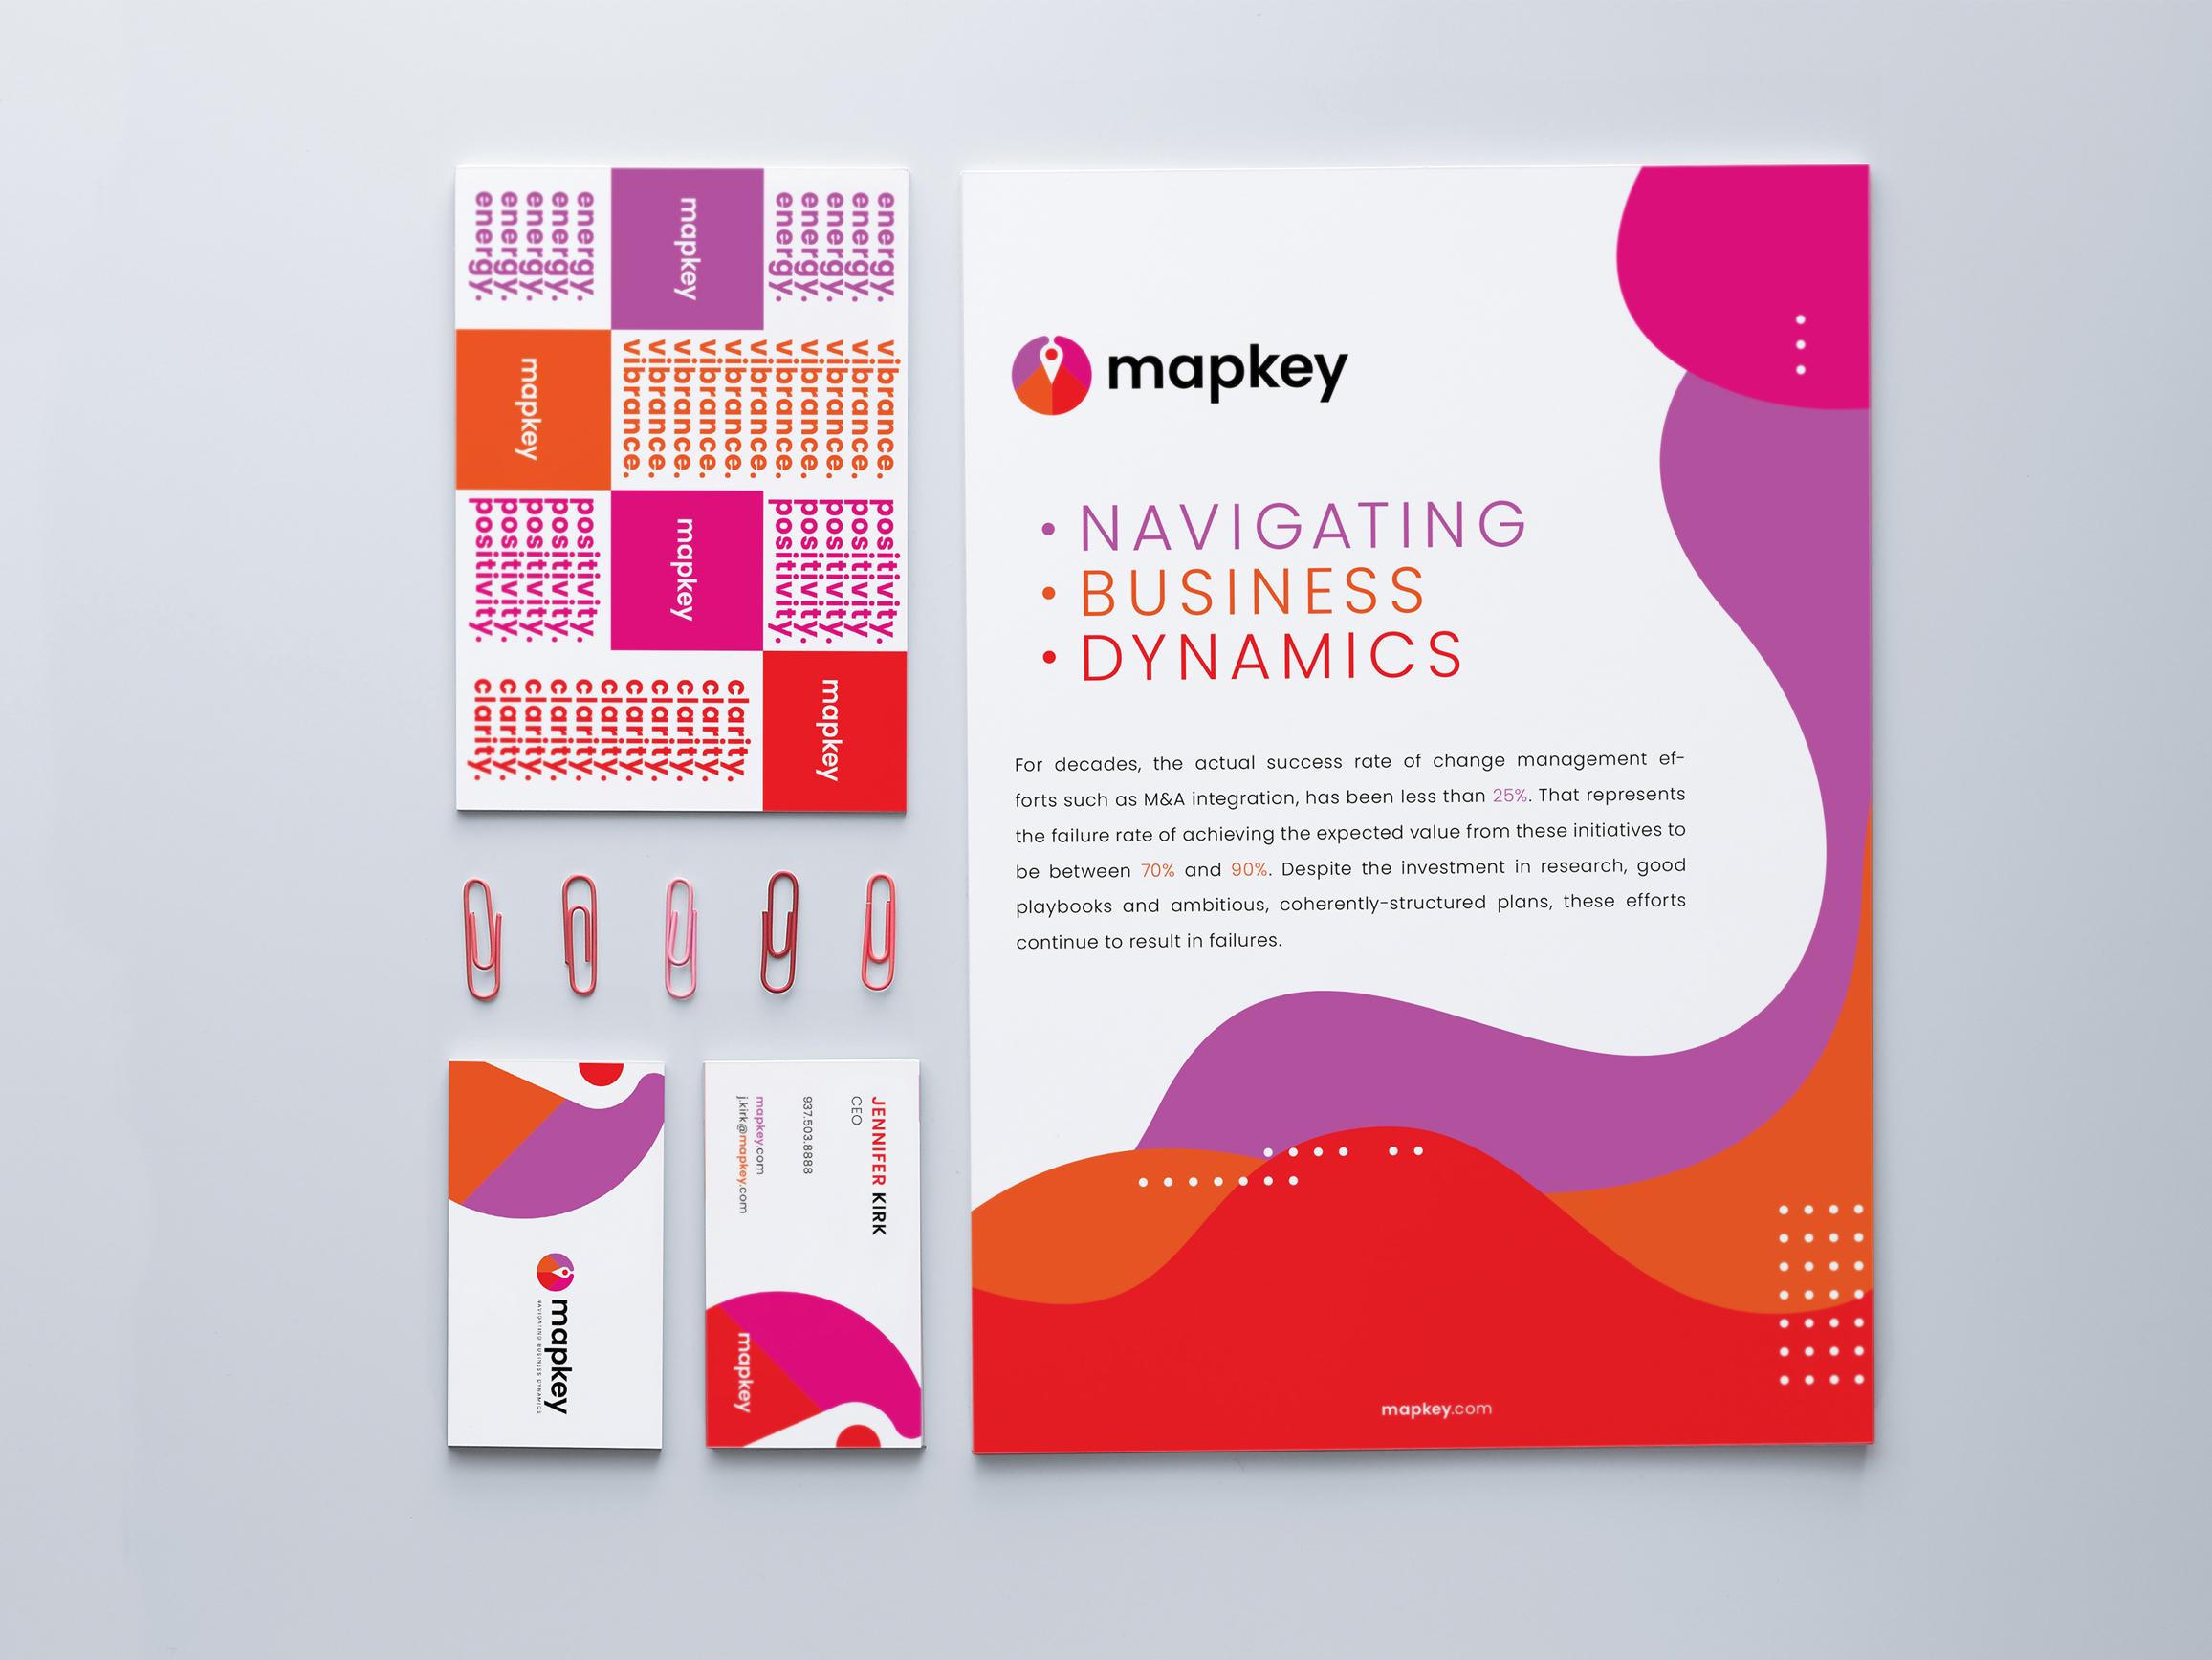 https://trpeskidesign.com/project/mapkey/